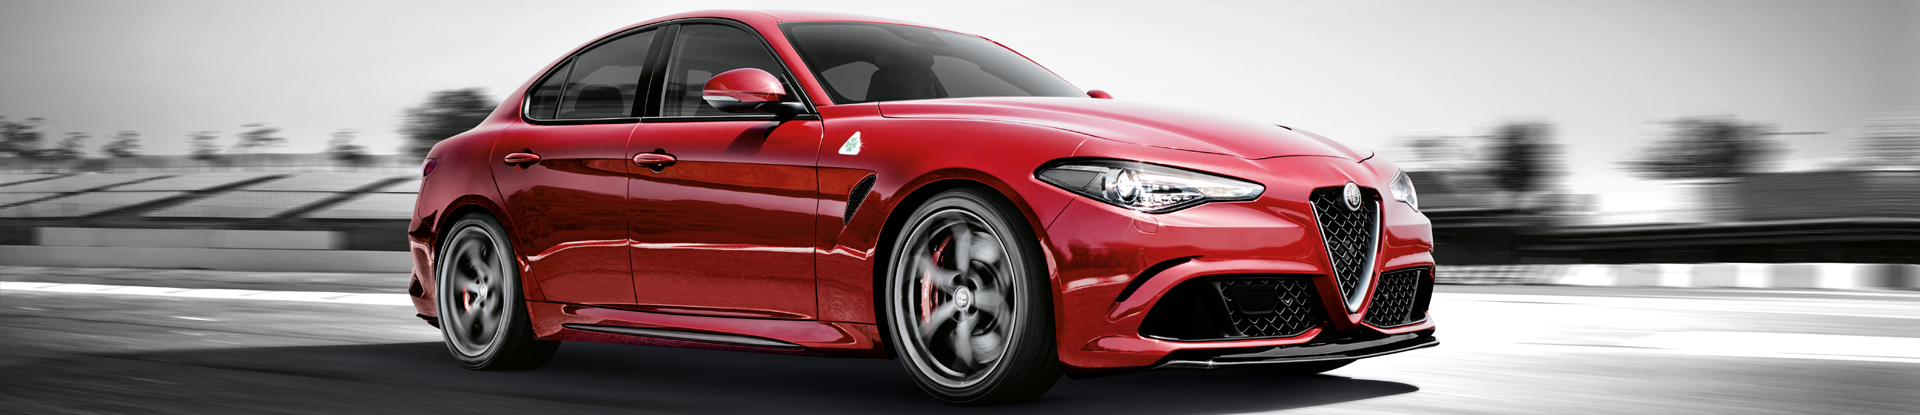 Alfa Romeo bei PA Preckel präsentiert die Giulia